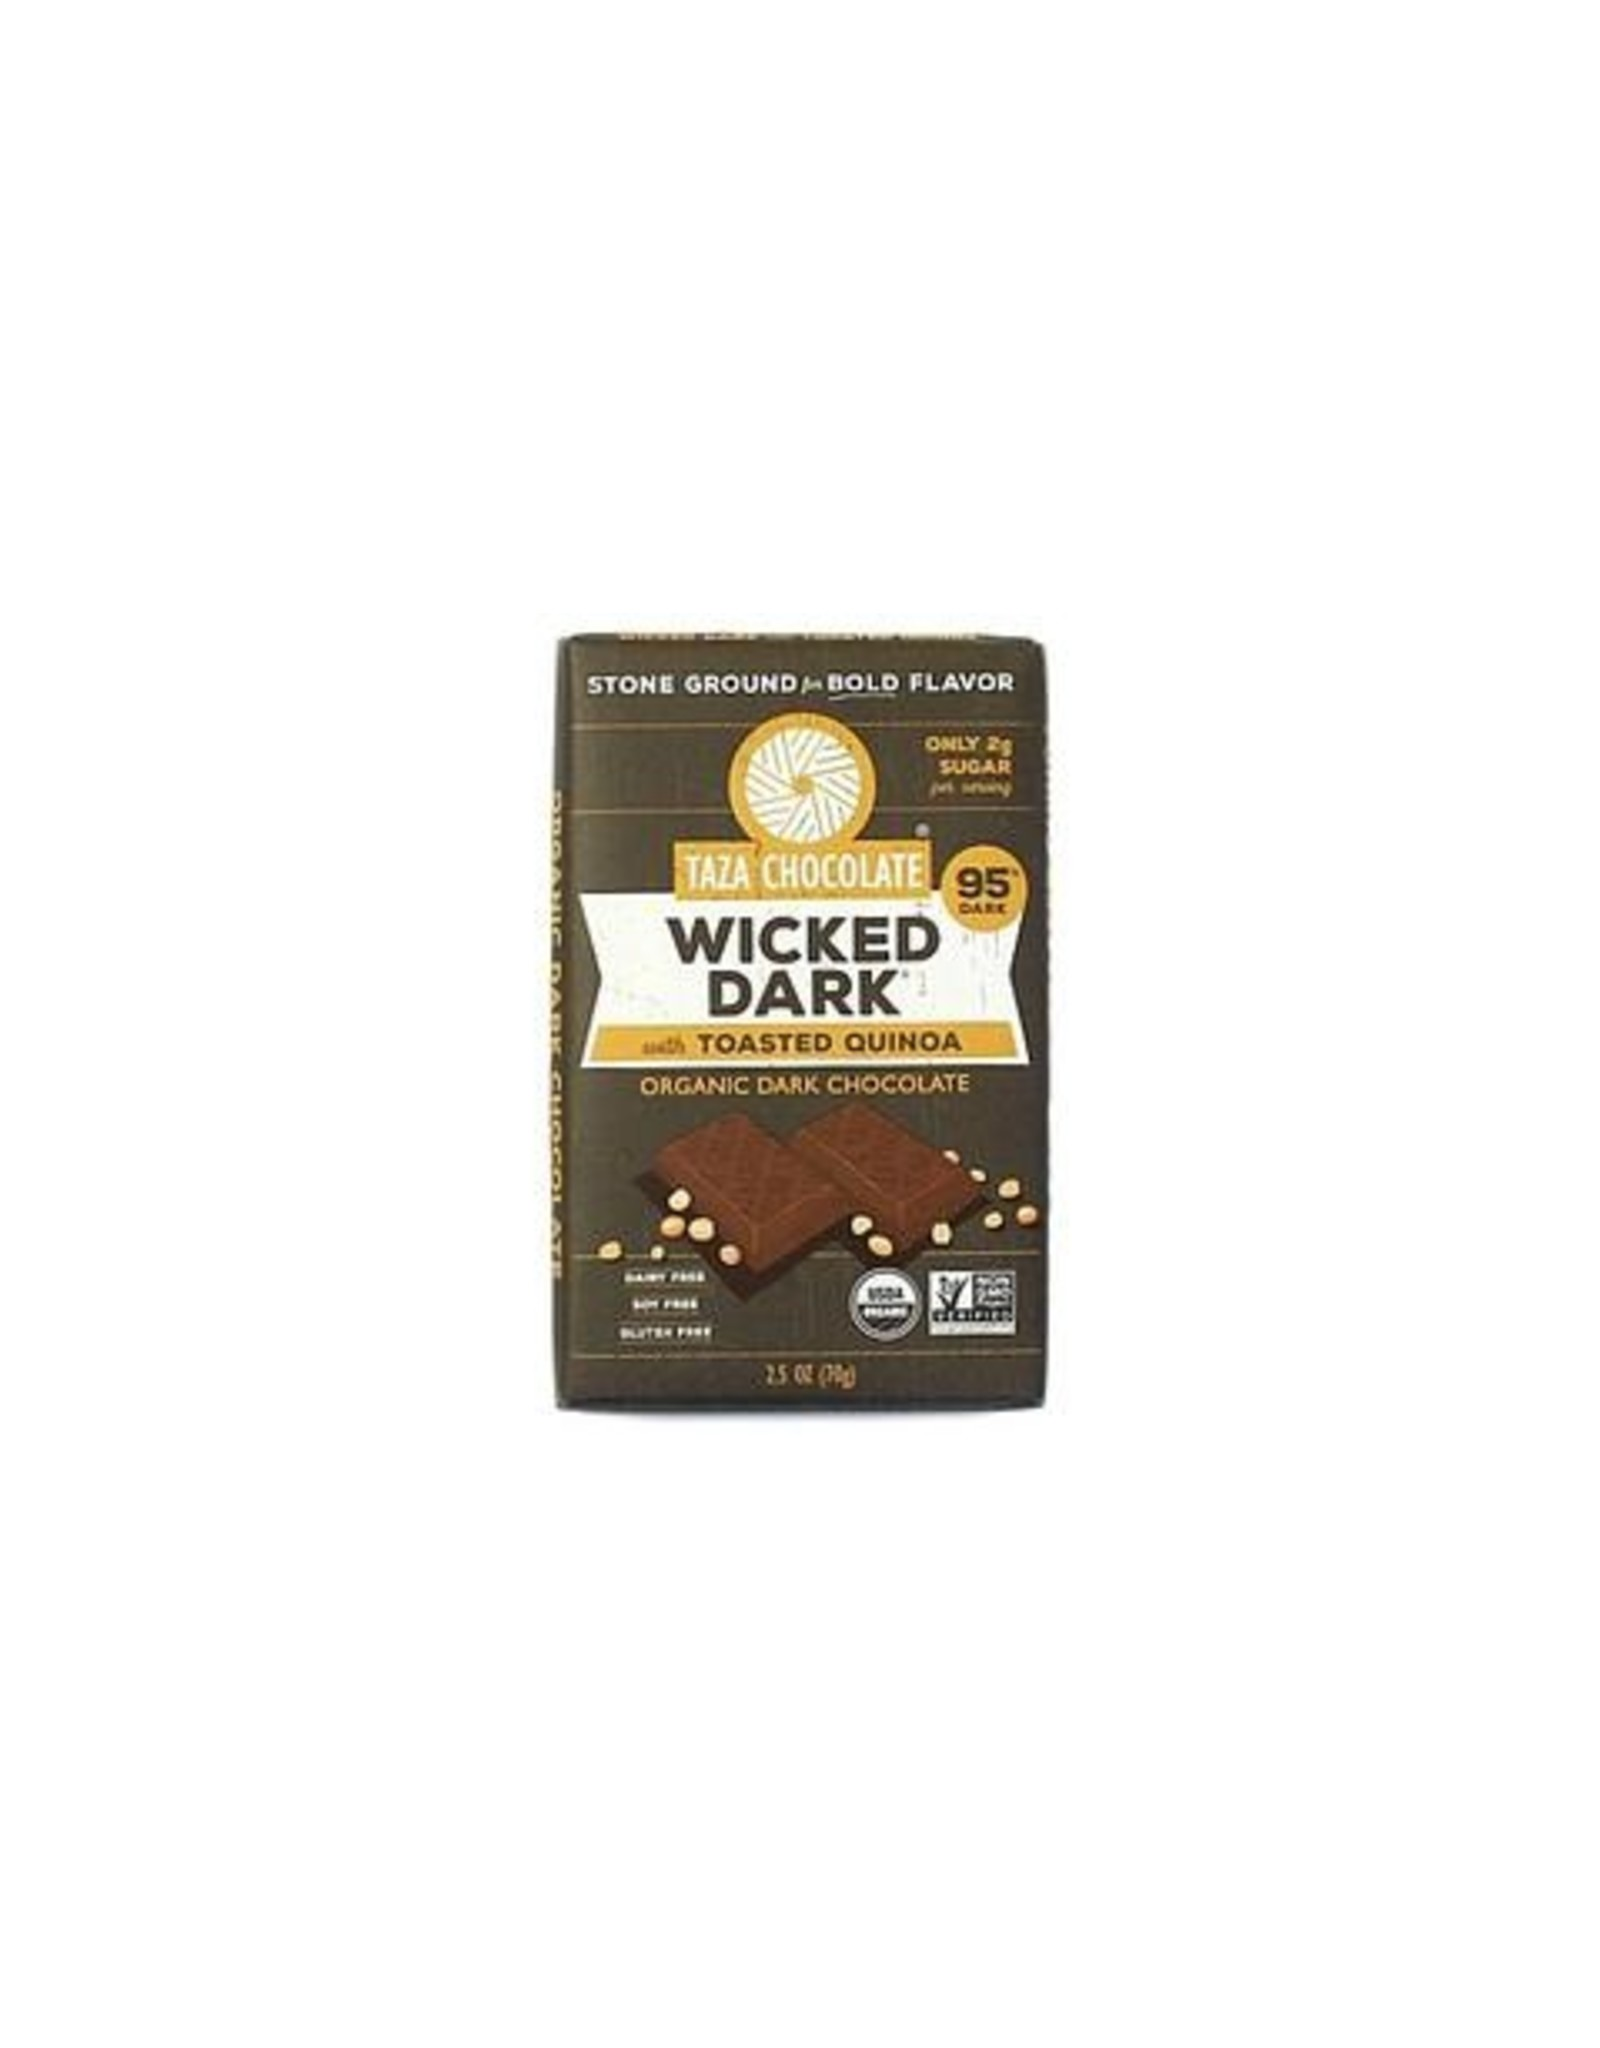 Taza Chocolate Taza Organic Wicked Dark Chocolate Bar with Quinoa